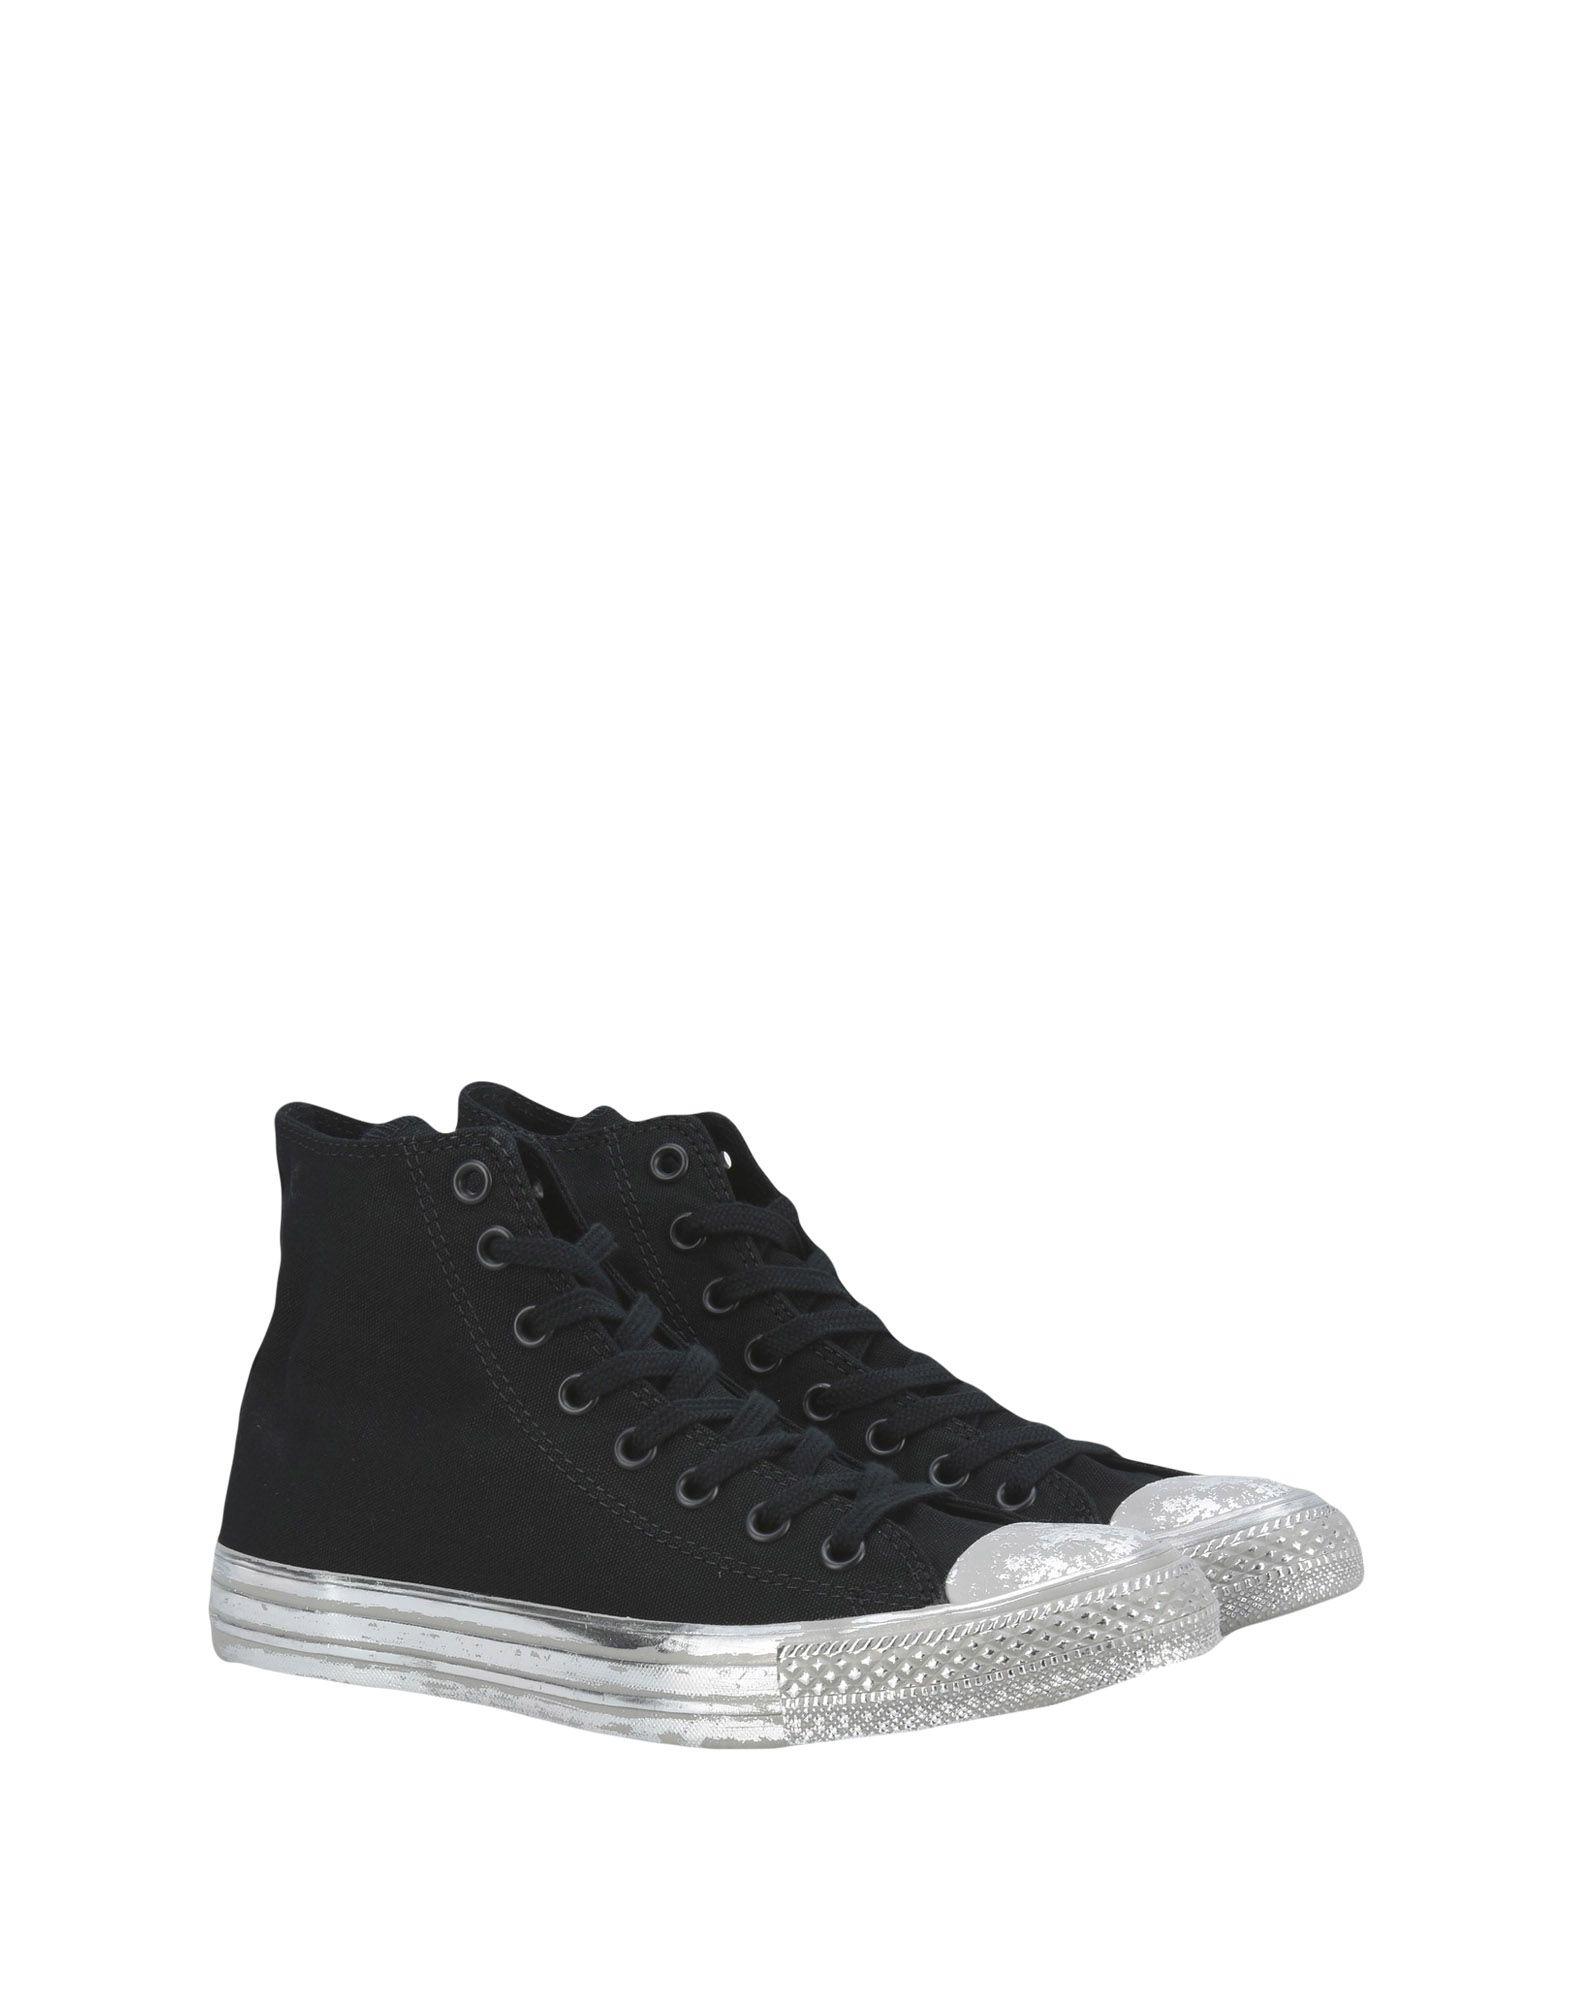 Converse All Canvas Star Ct As Hi Canvas All Color Rubber  11216197HU Gute Qualität beliebte Schuhe 2e0ed3